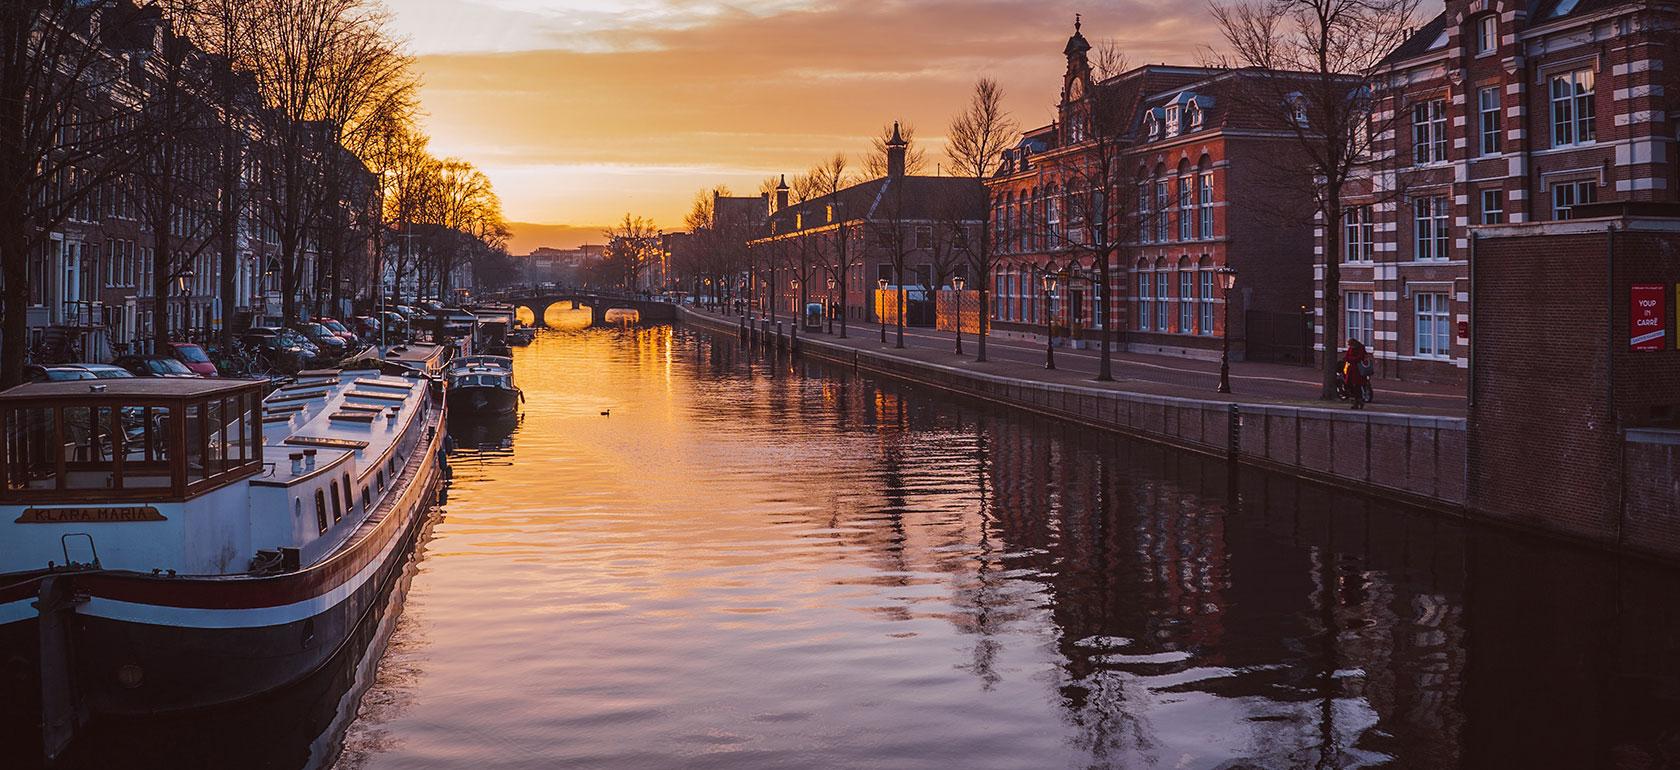 Amsterdam Canal Cruise, Wahana Terbaik Menikmati Pesona Amsterdam